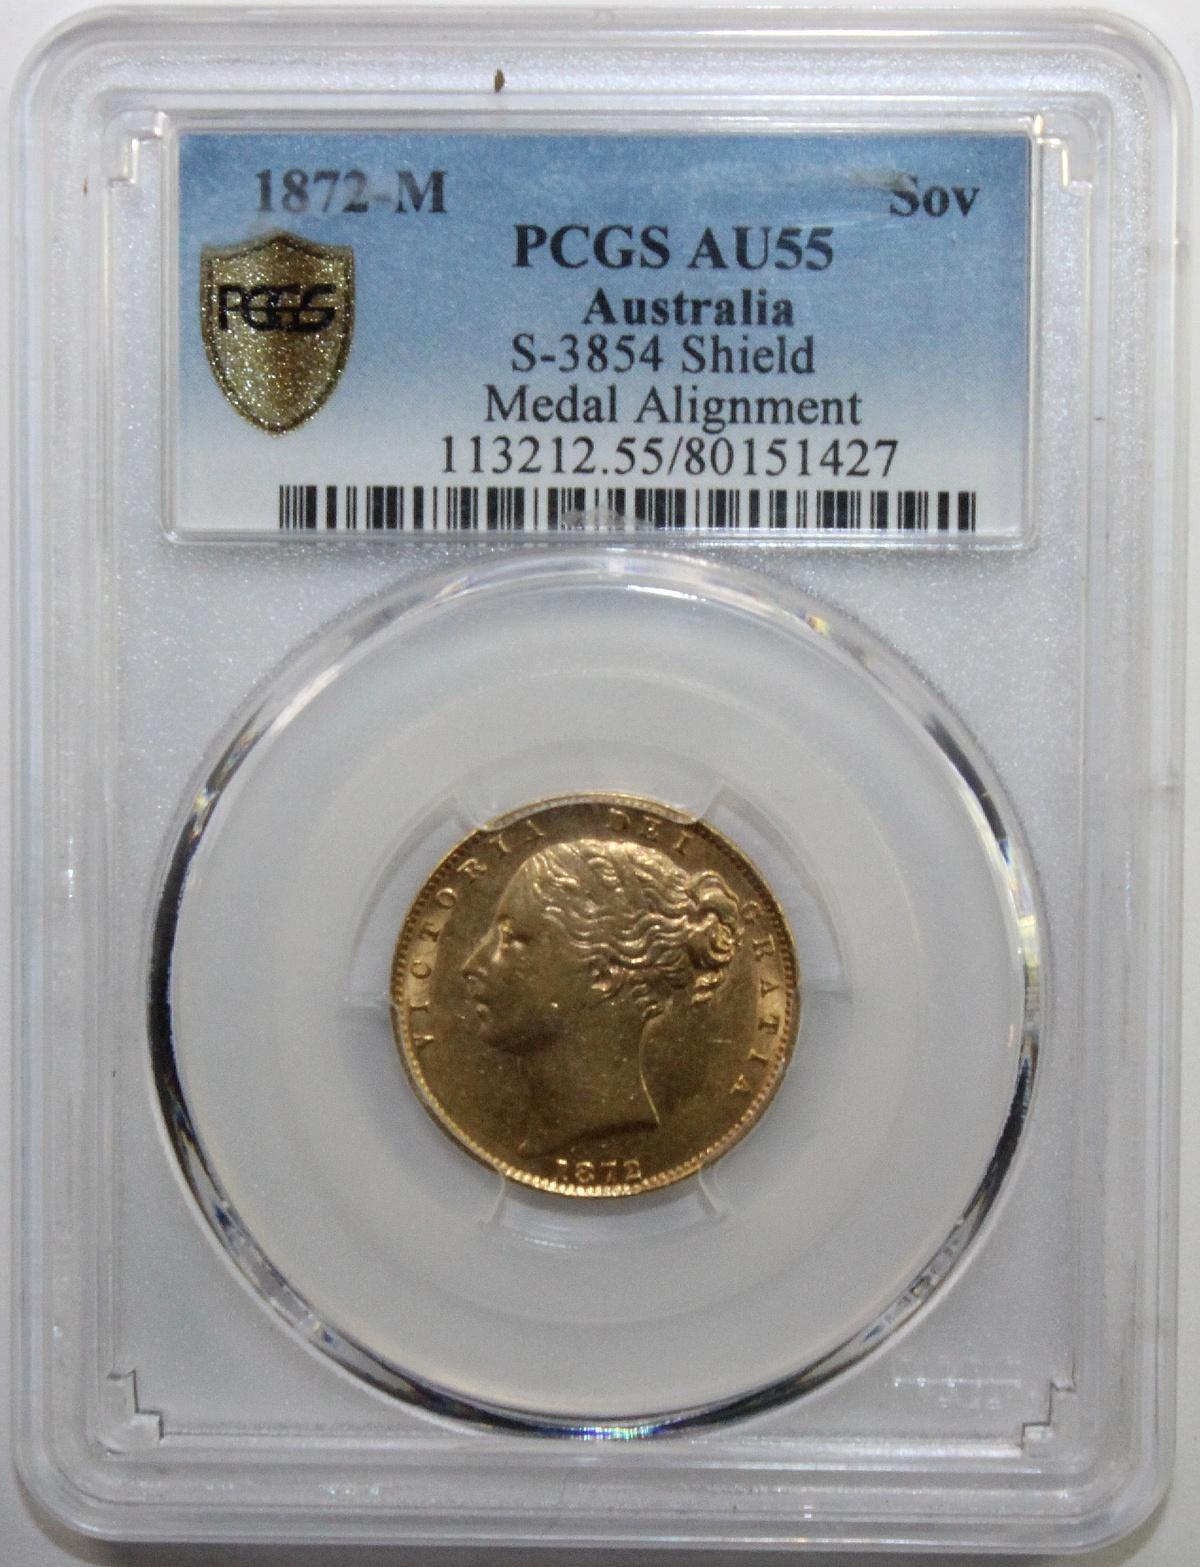 Australia. 1872 M 'Medal Alignment' Gold (0.916) Sovereign, PCGS AU55